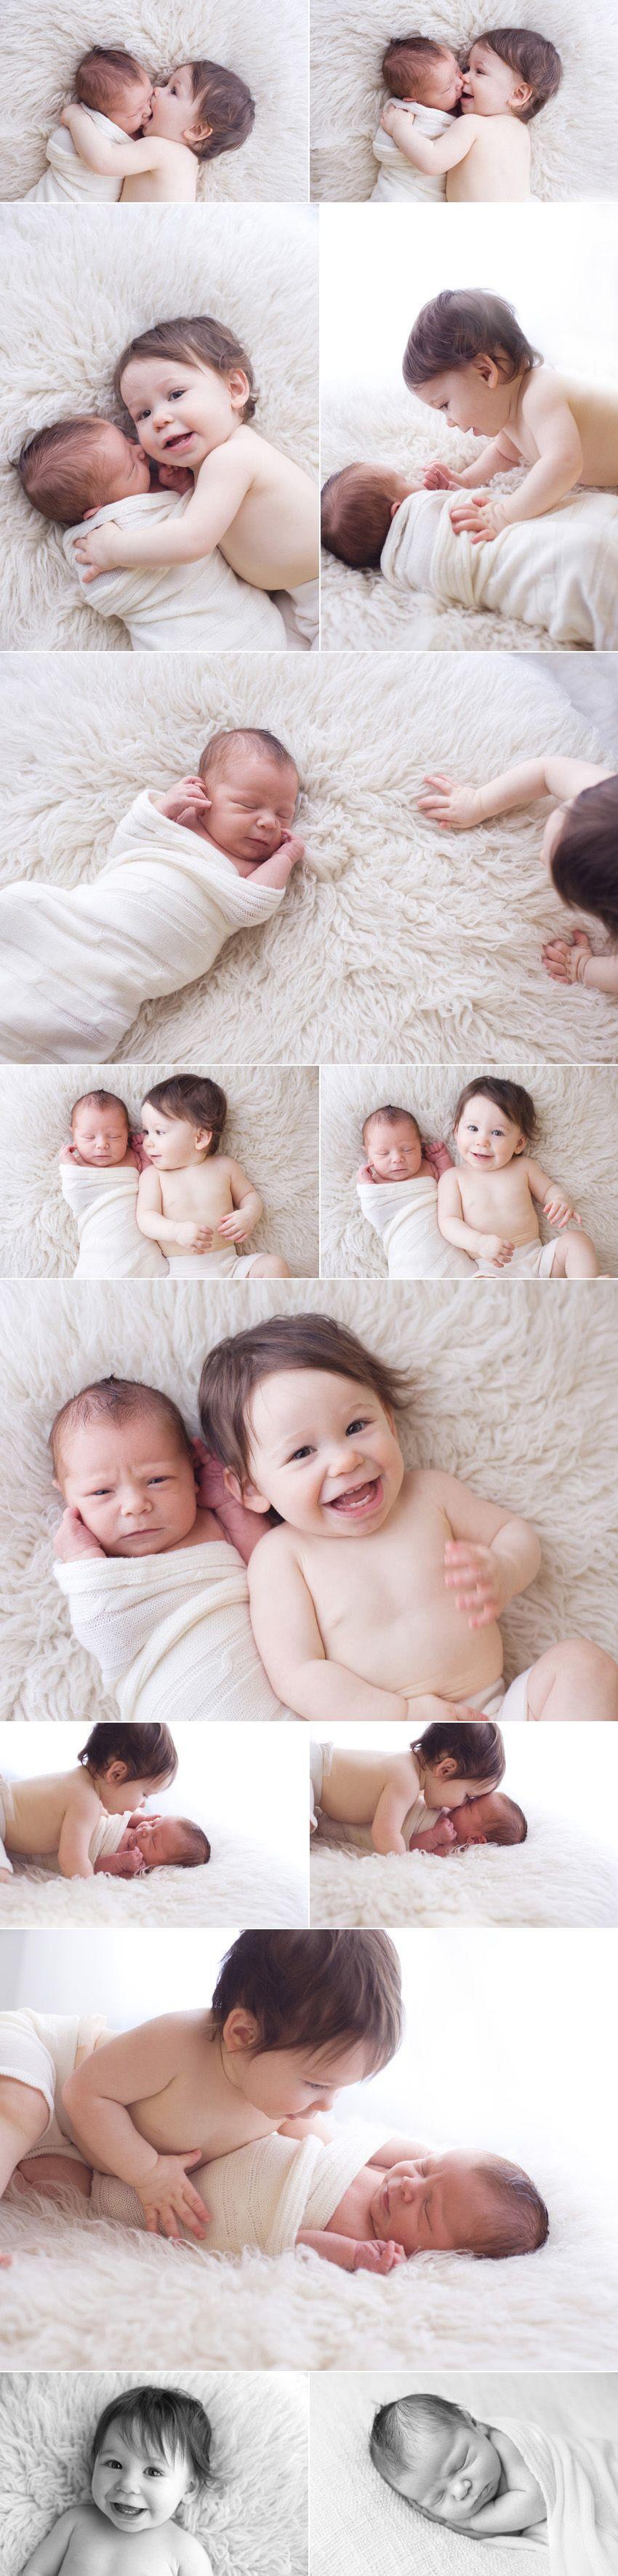 Newborn photography-Love this series